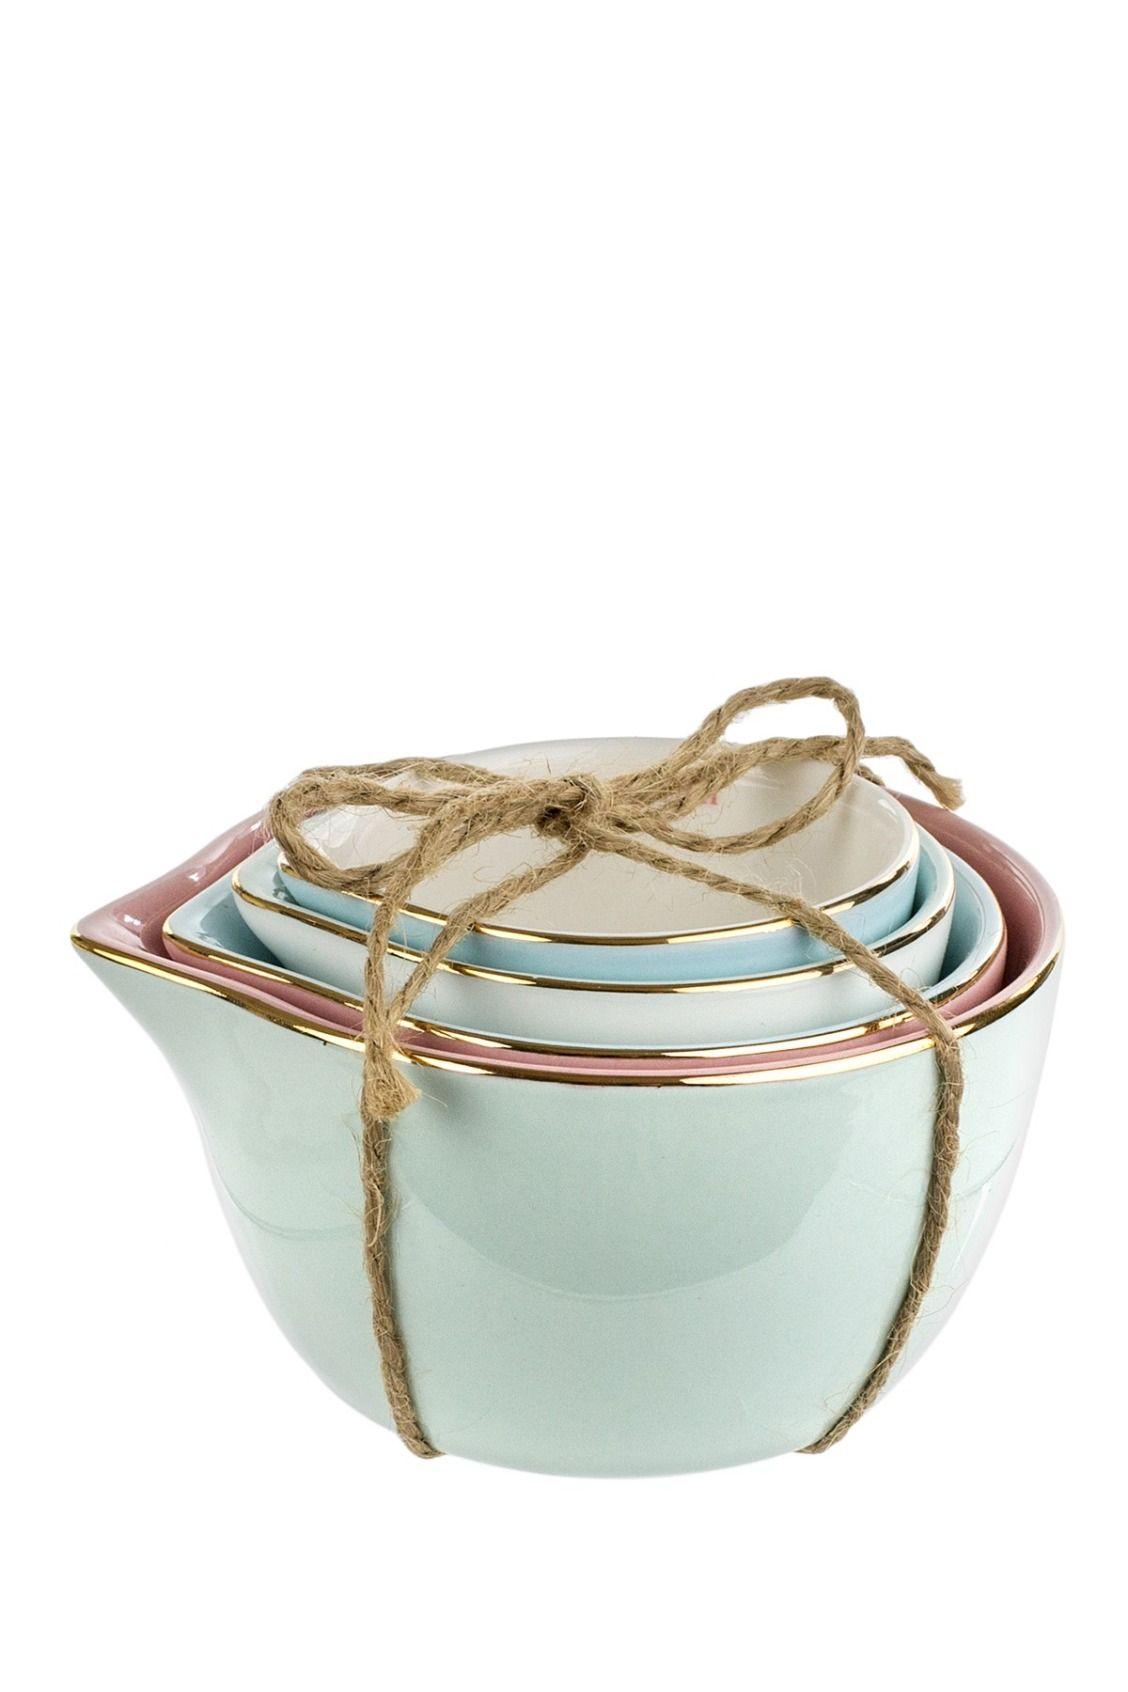 Tri Coastal Design Ceramic 4 Piece Measuring Cups